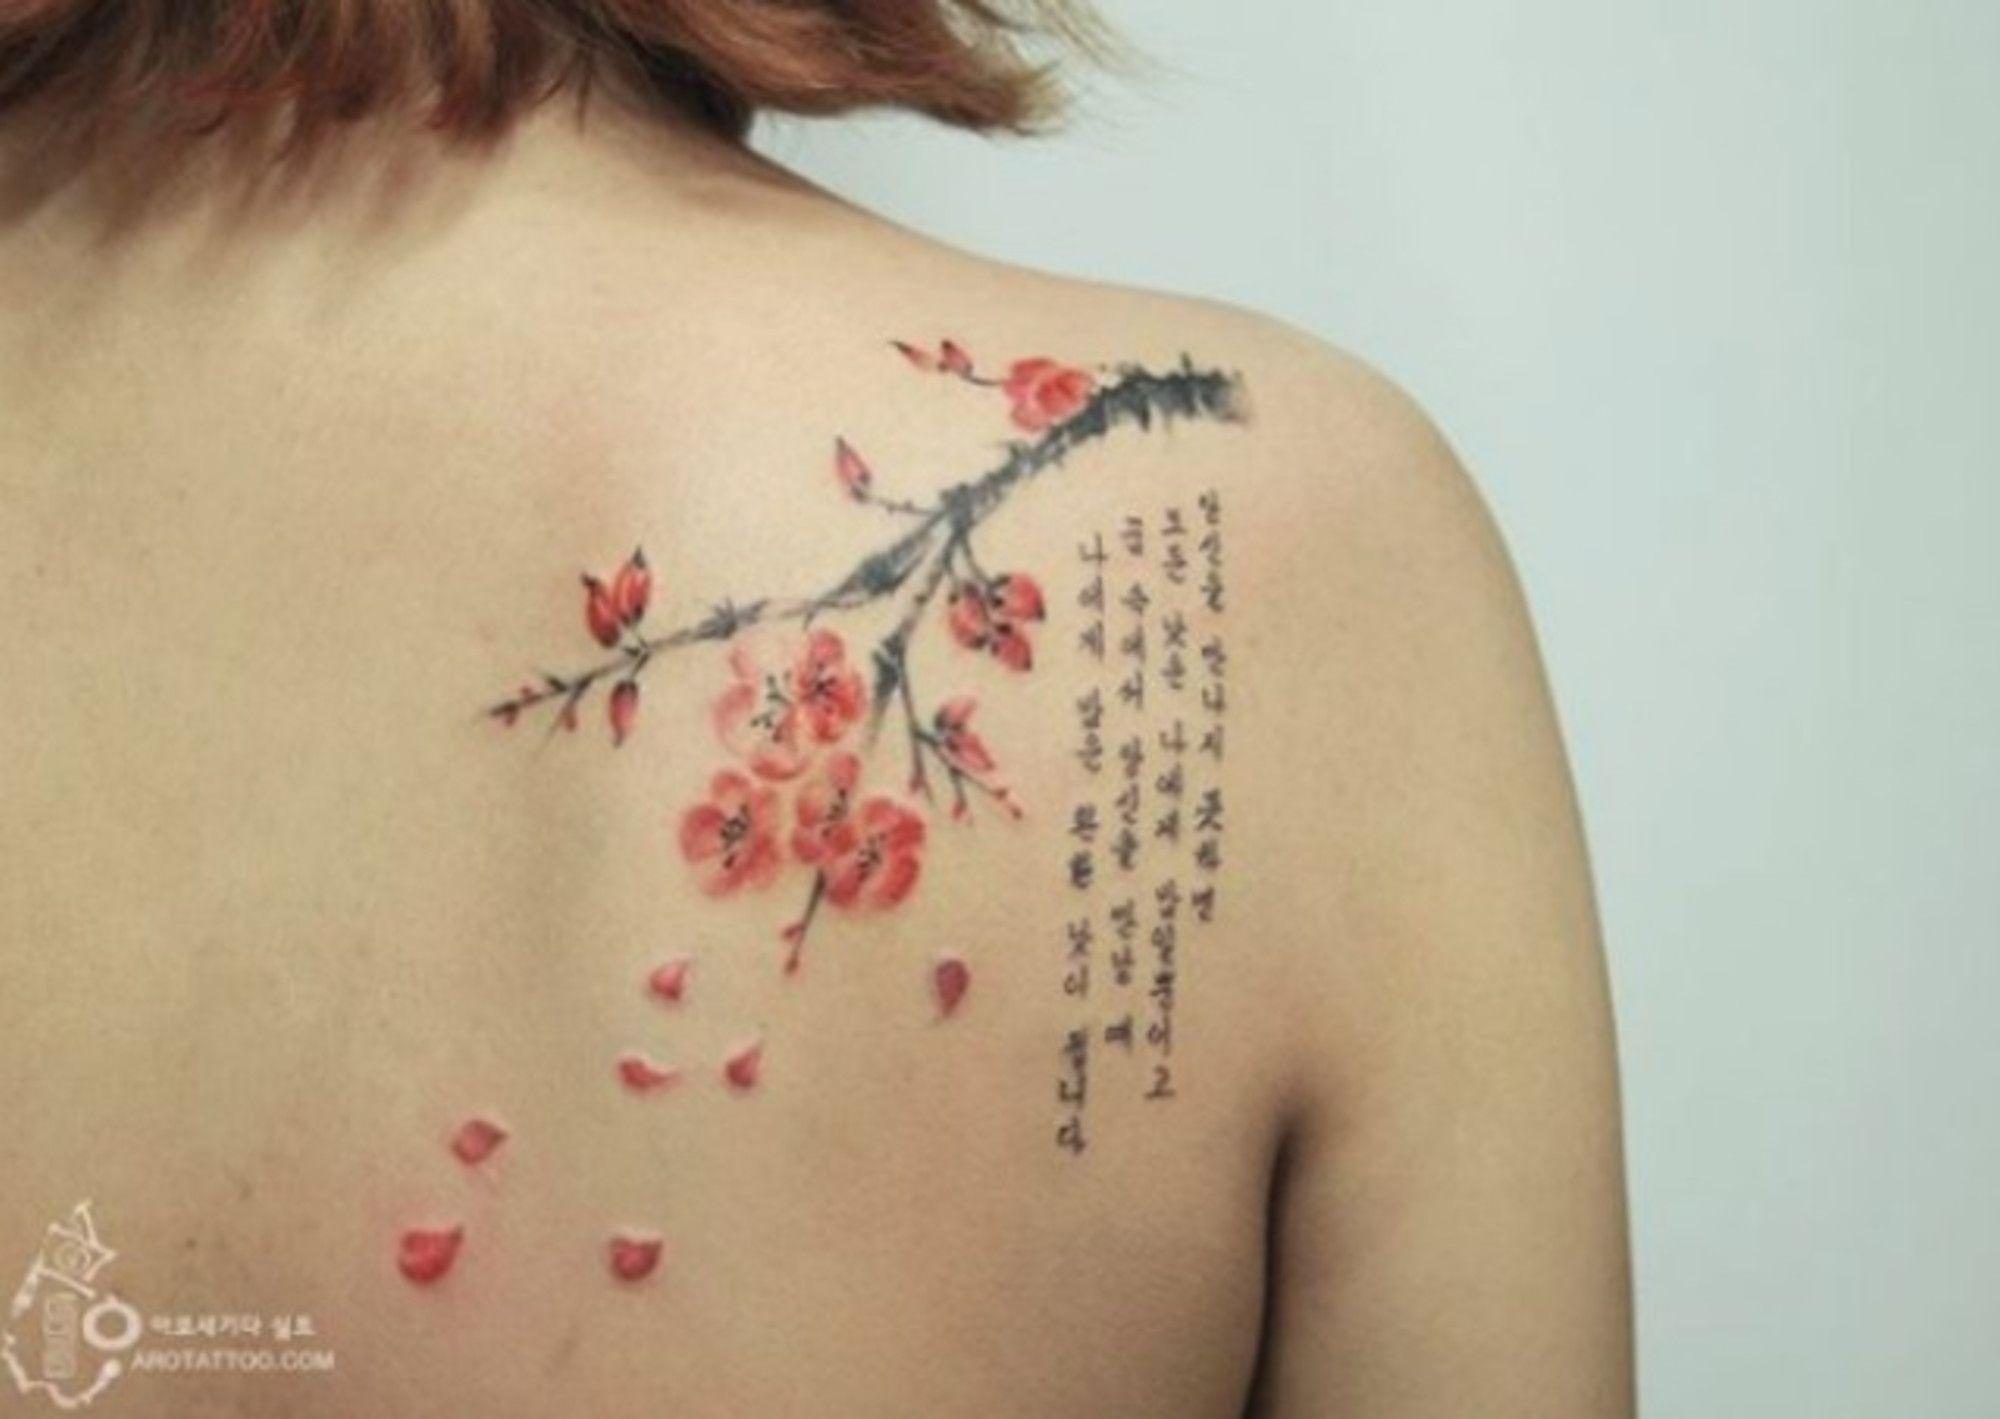 15 beautiful tattoos that look like watercolour paintings